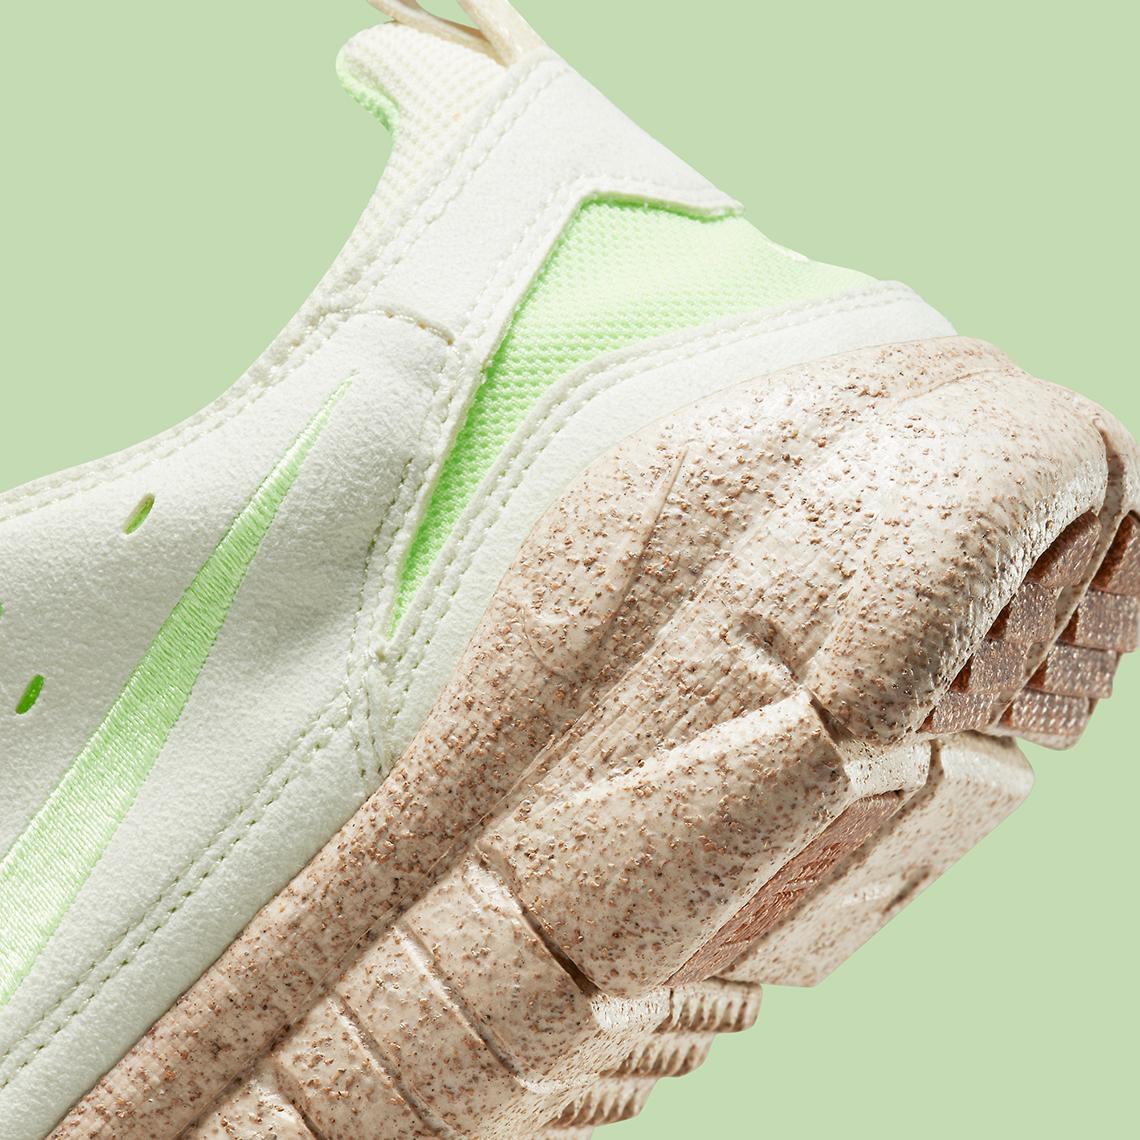 Nike-Free-Run-Trail-CZ9079-100-7.jpg?w=1140